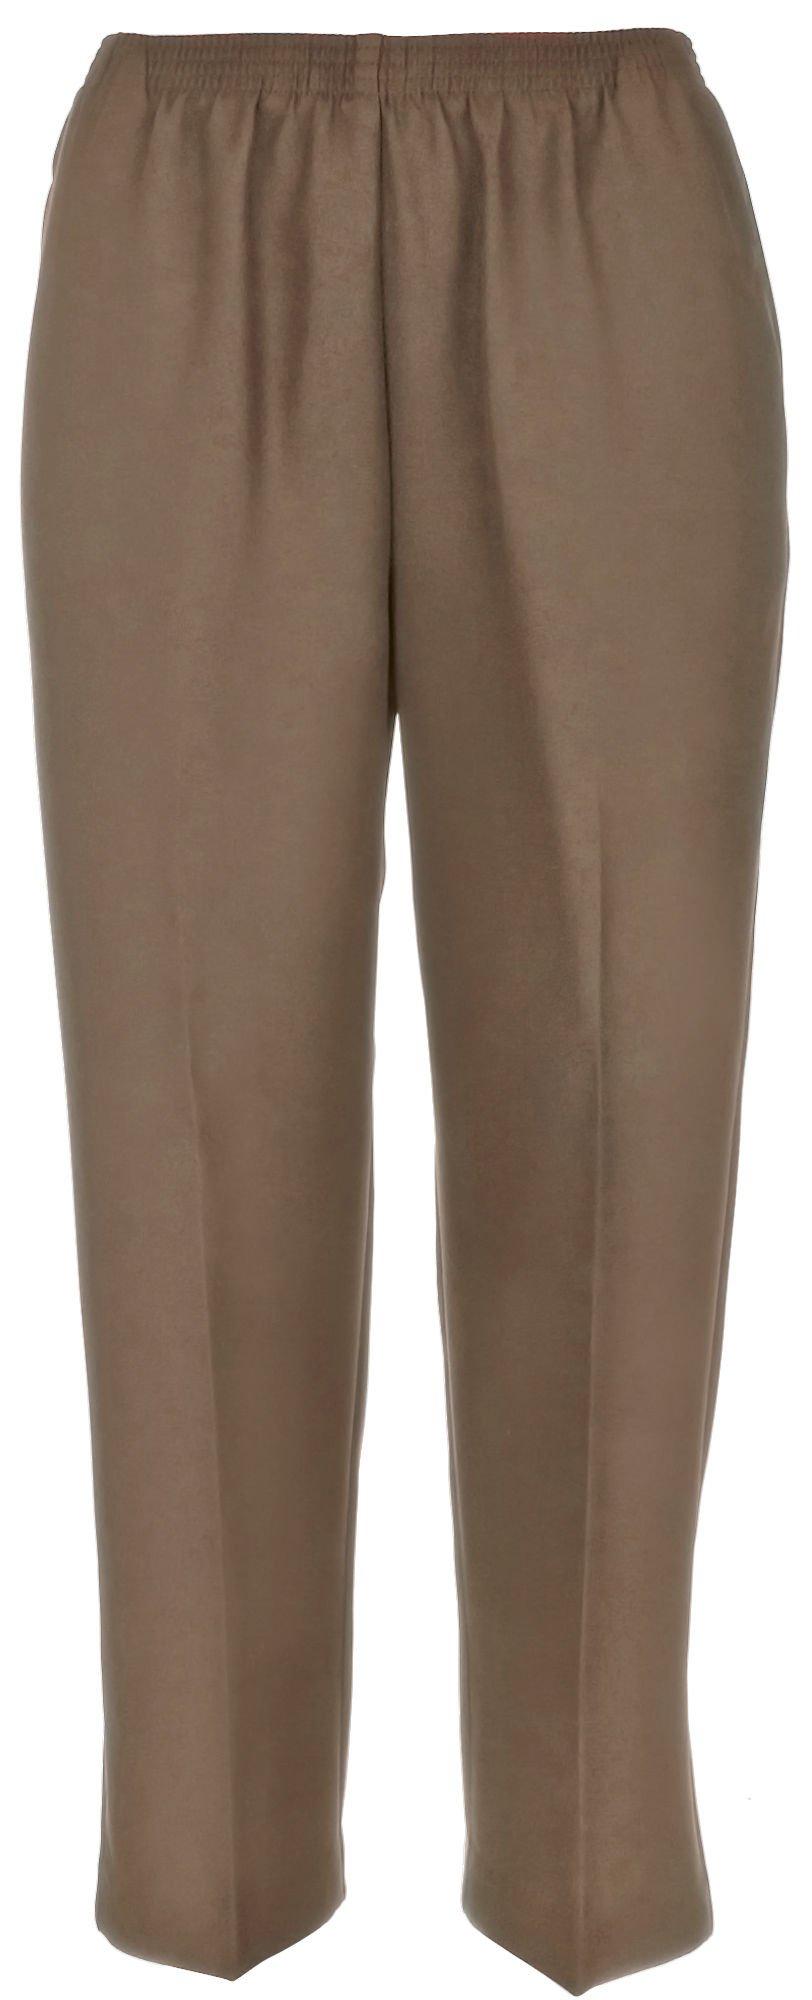 Alfred Dunner Women's Petite Polyester Pull-On Pants - Short Length, Tan, 10 Petite Short